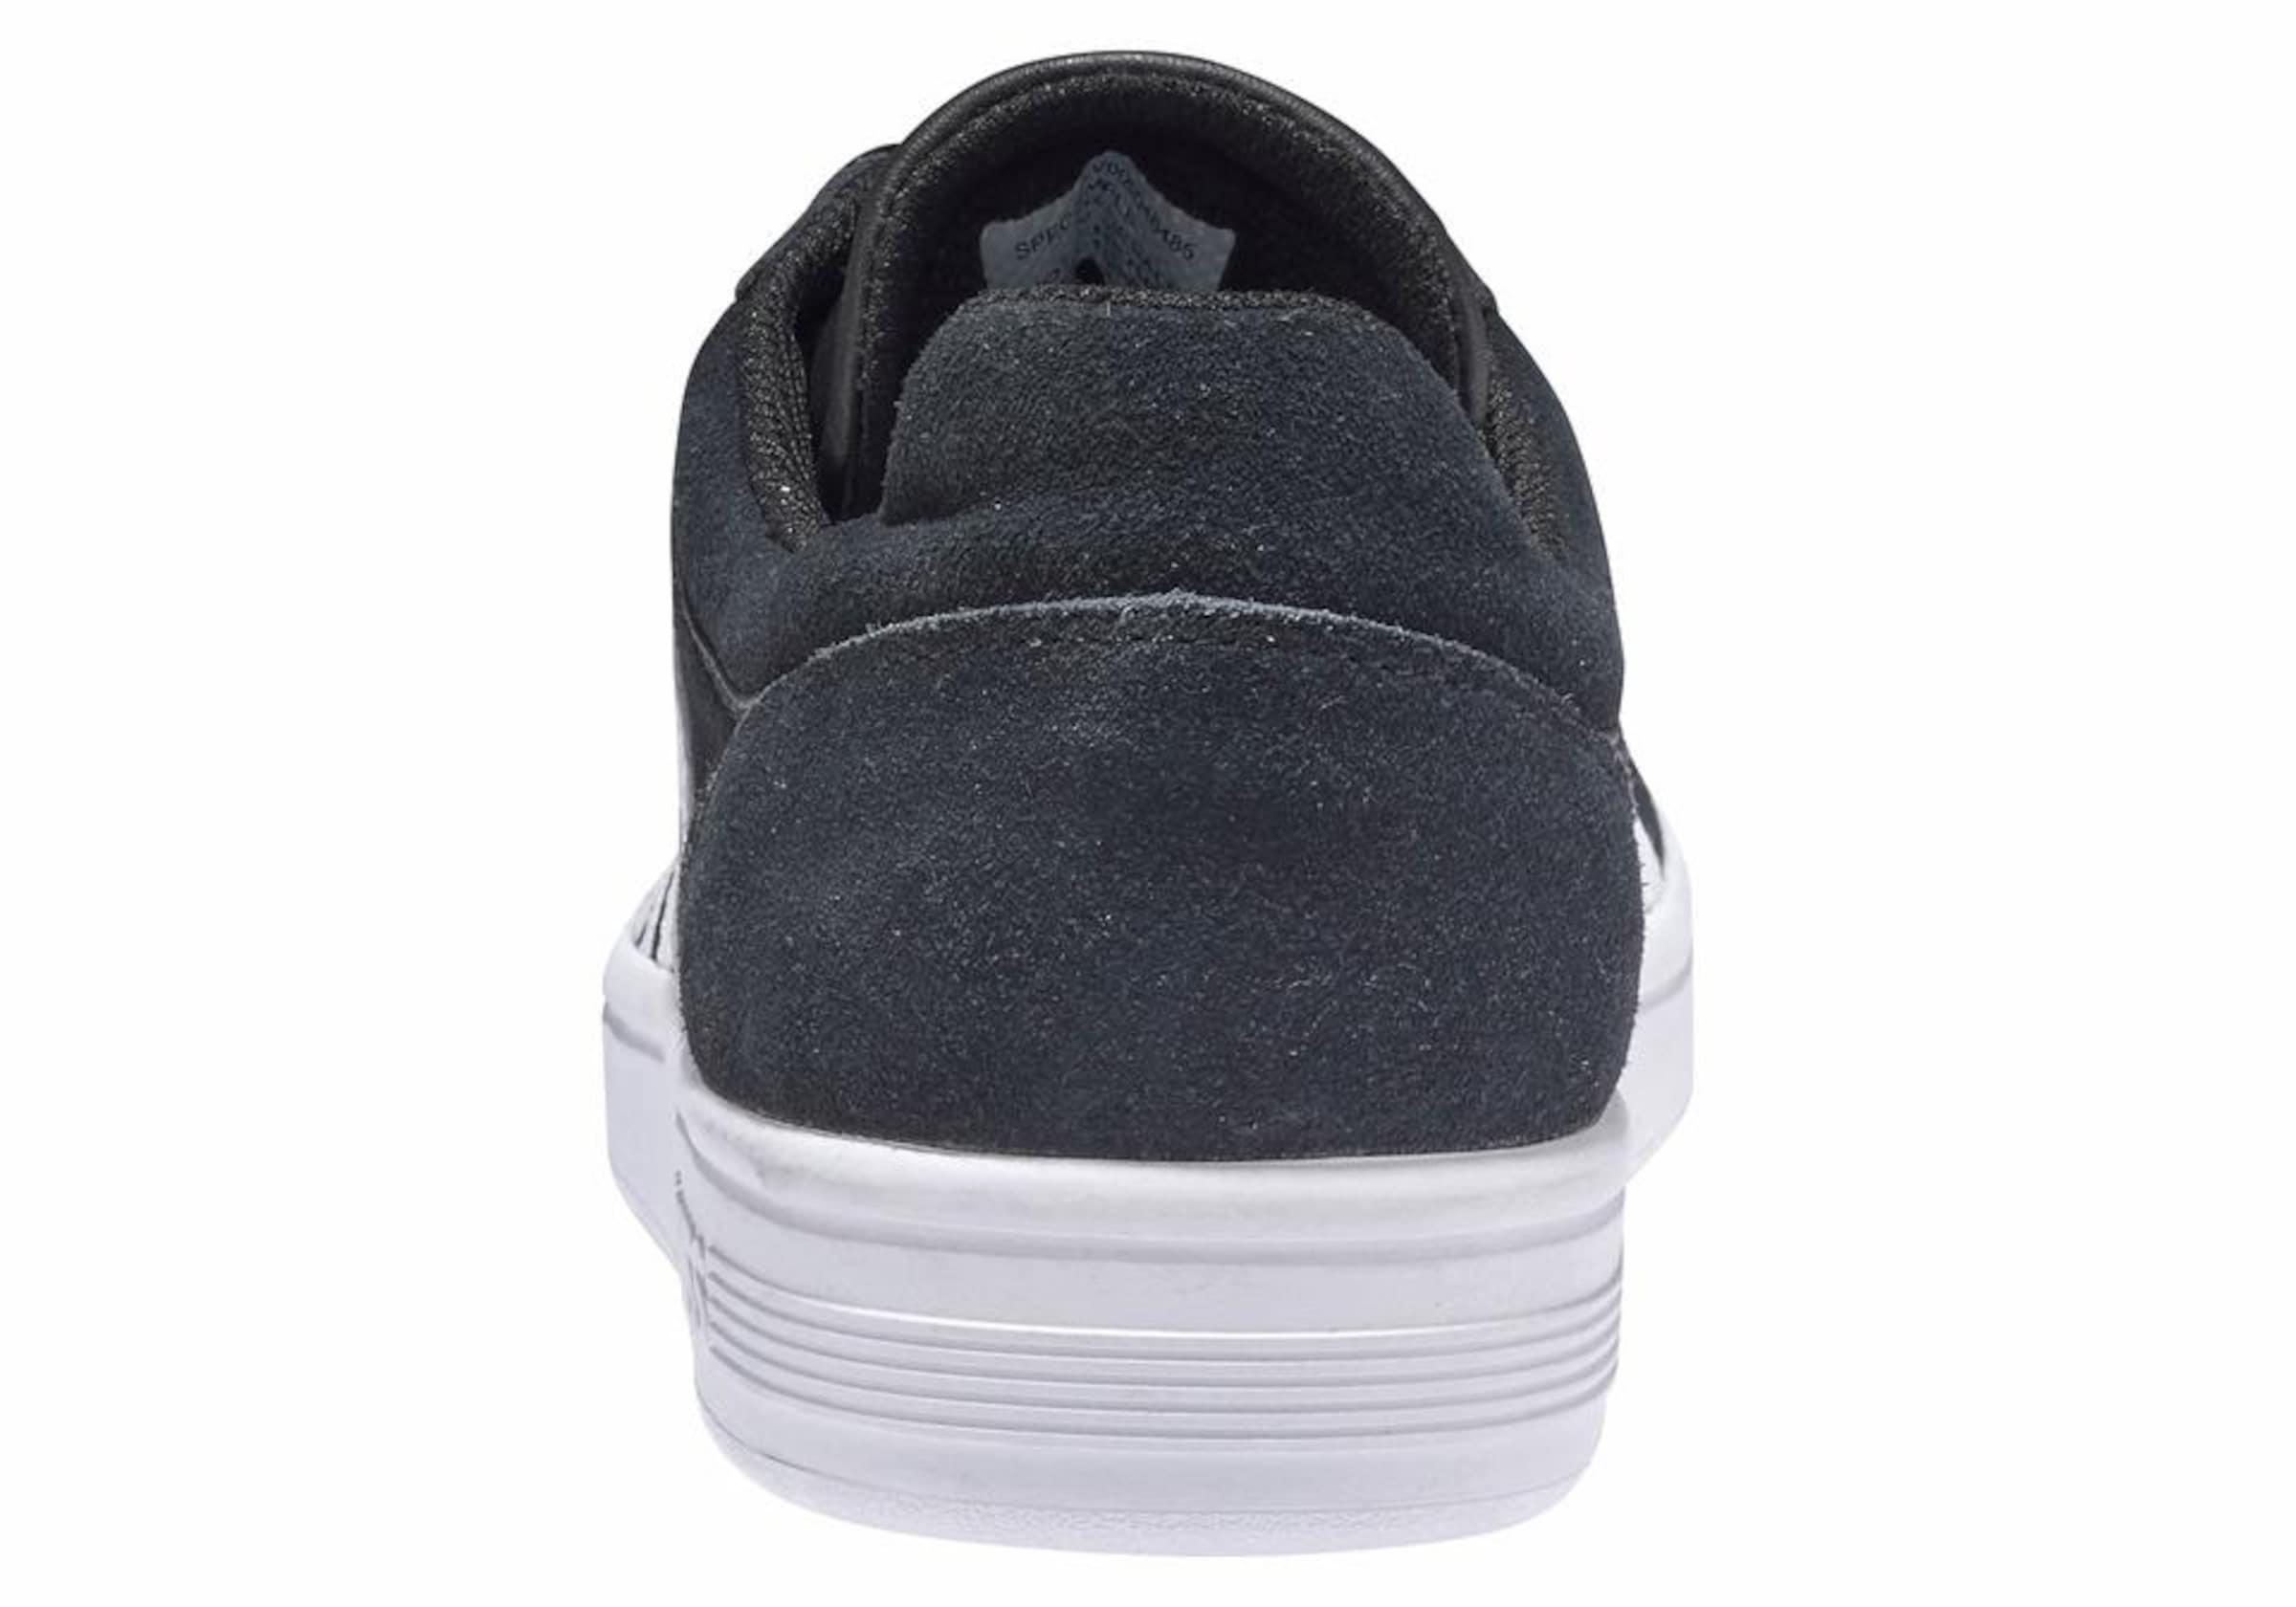 swiss Sneaker Schwarz In Cheswick K Suede' 'court 8wmNv0n